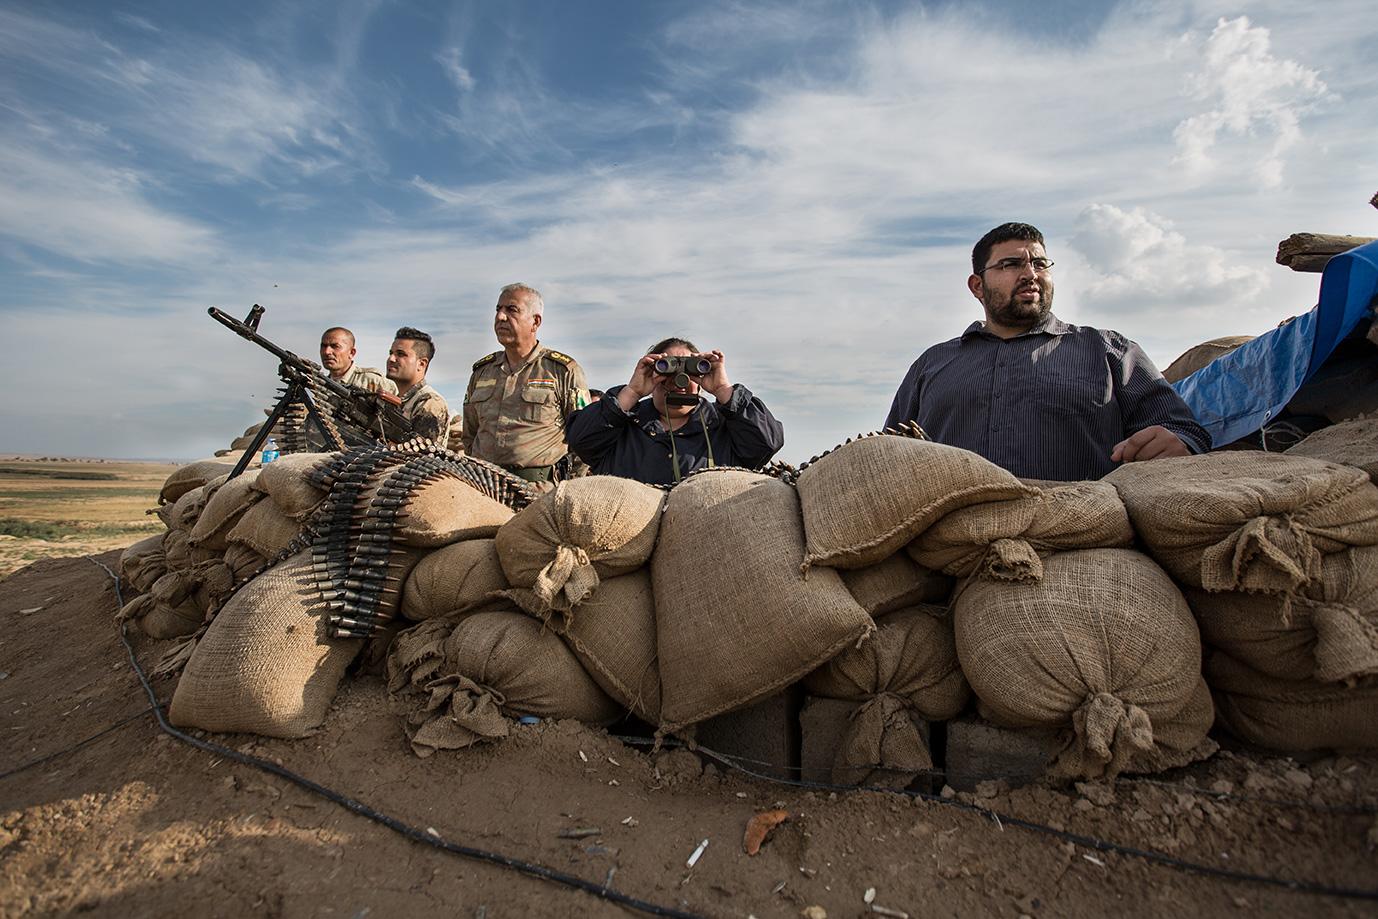 10_frontline-isis-peshmerga-iraq